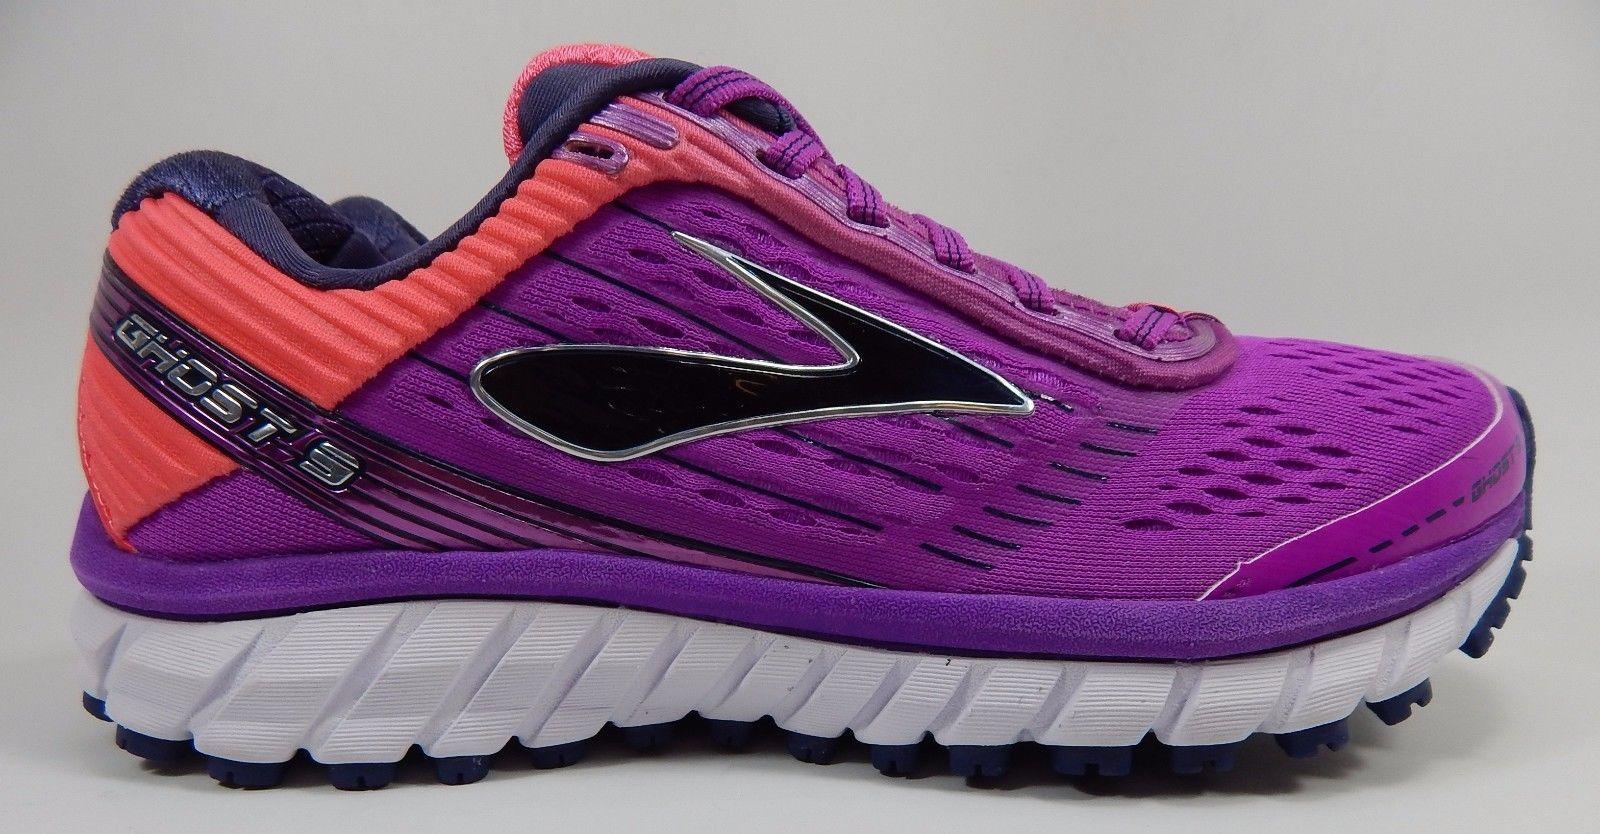 b1aa3396e8f Brooks Ghost 9 Women s Running Shoes Size US 7.5 M (B) EU 38.5 1202251B563